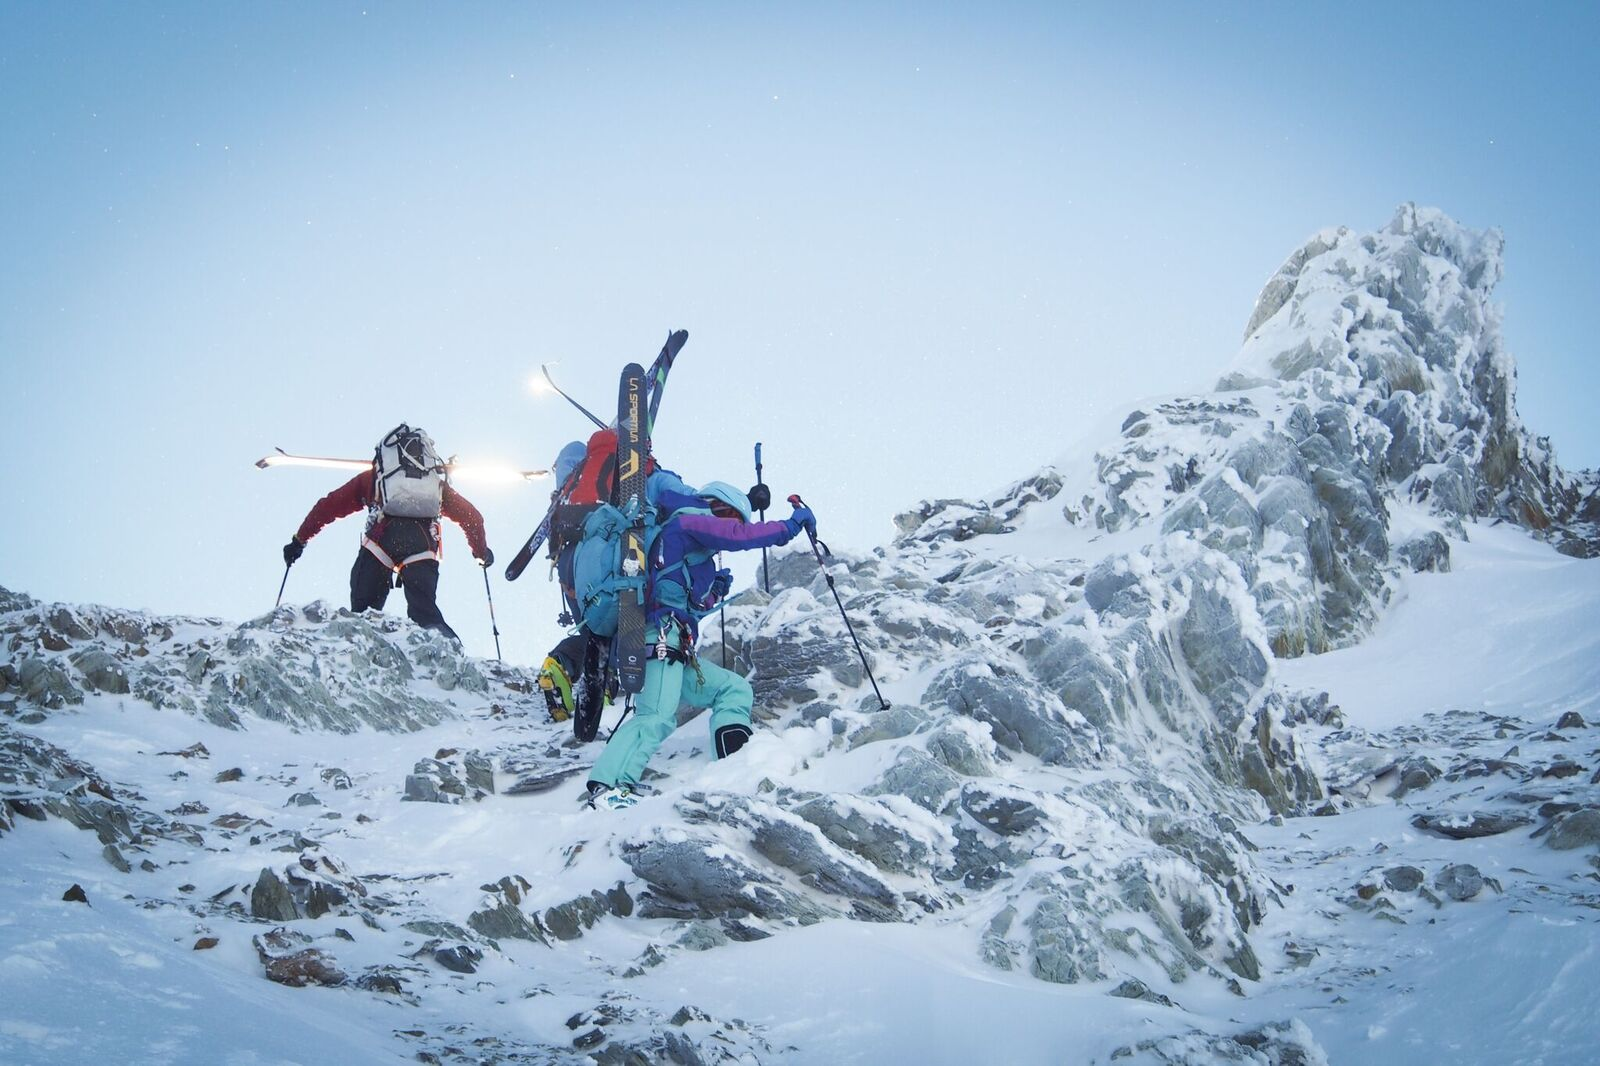 Working towards the summit of Olive Peak. Photo: Matt Reid